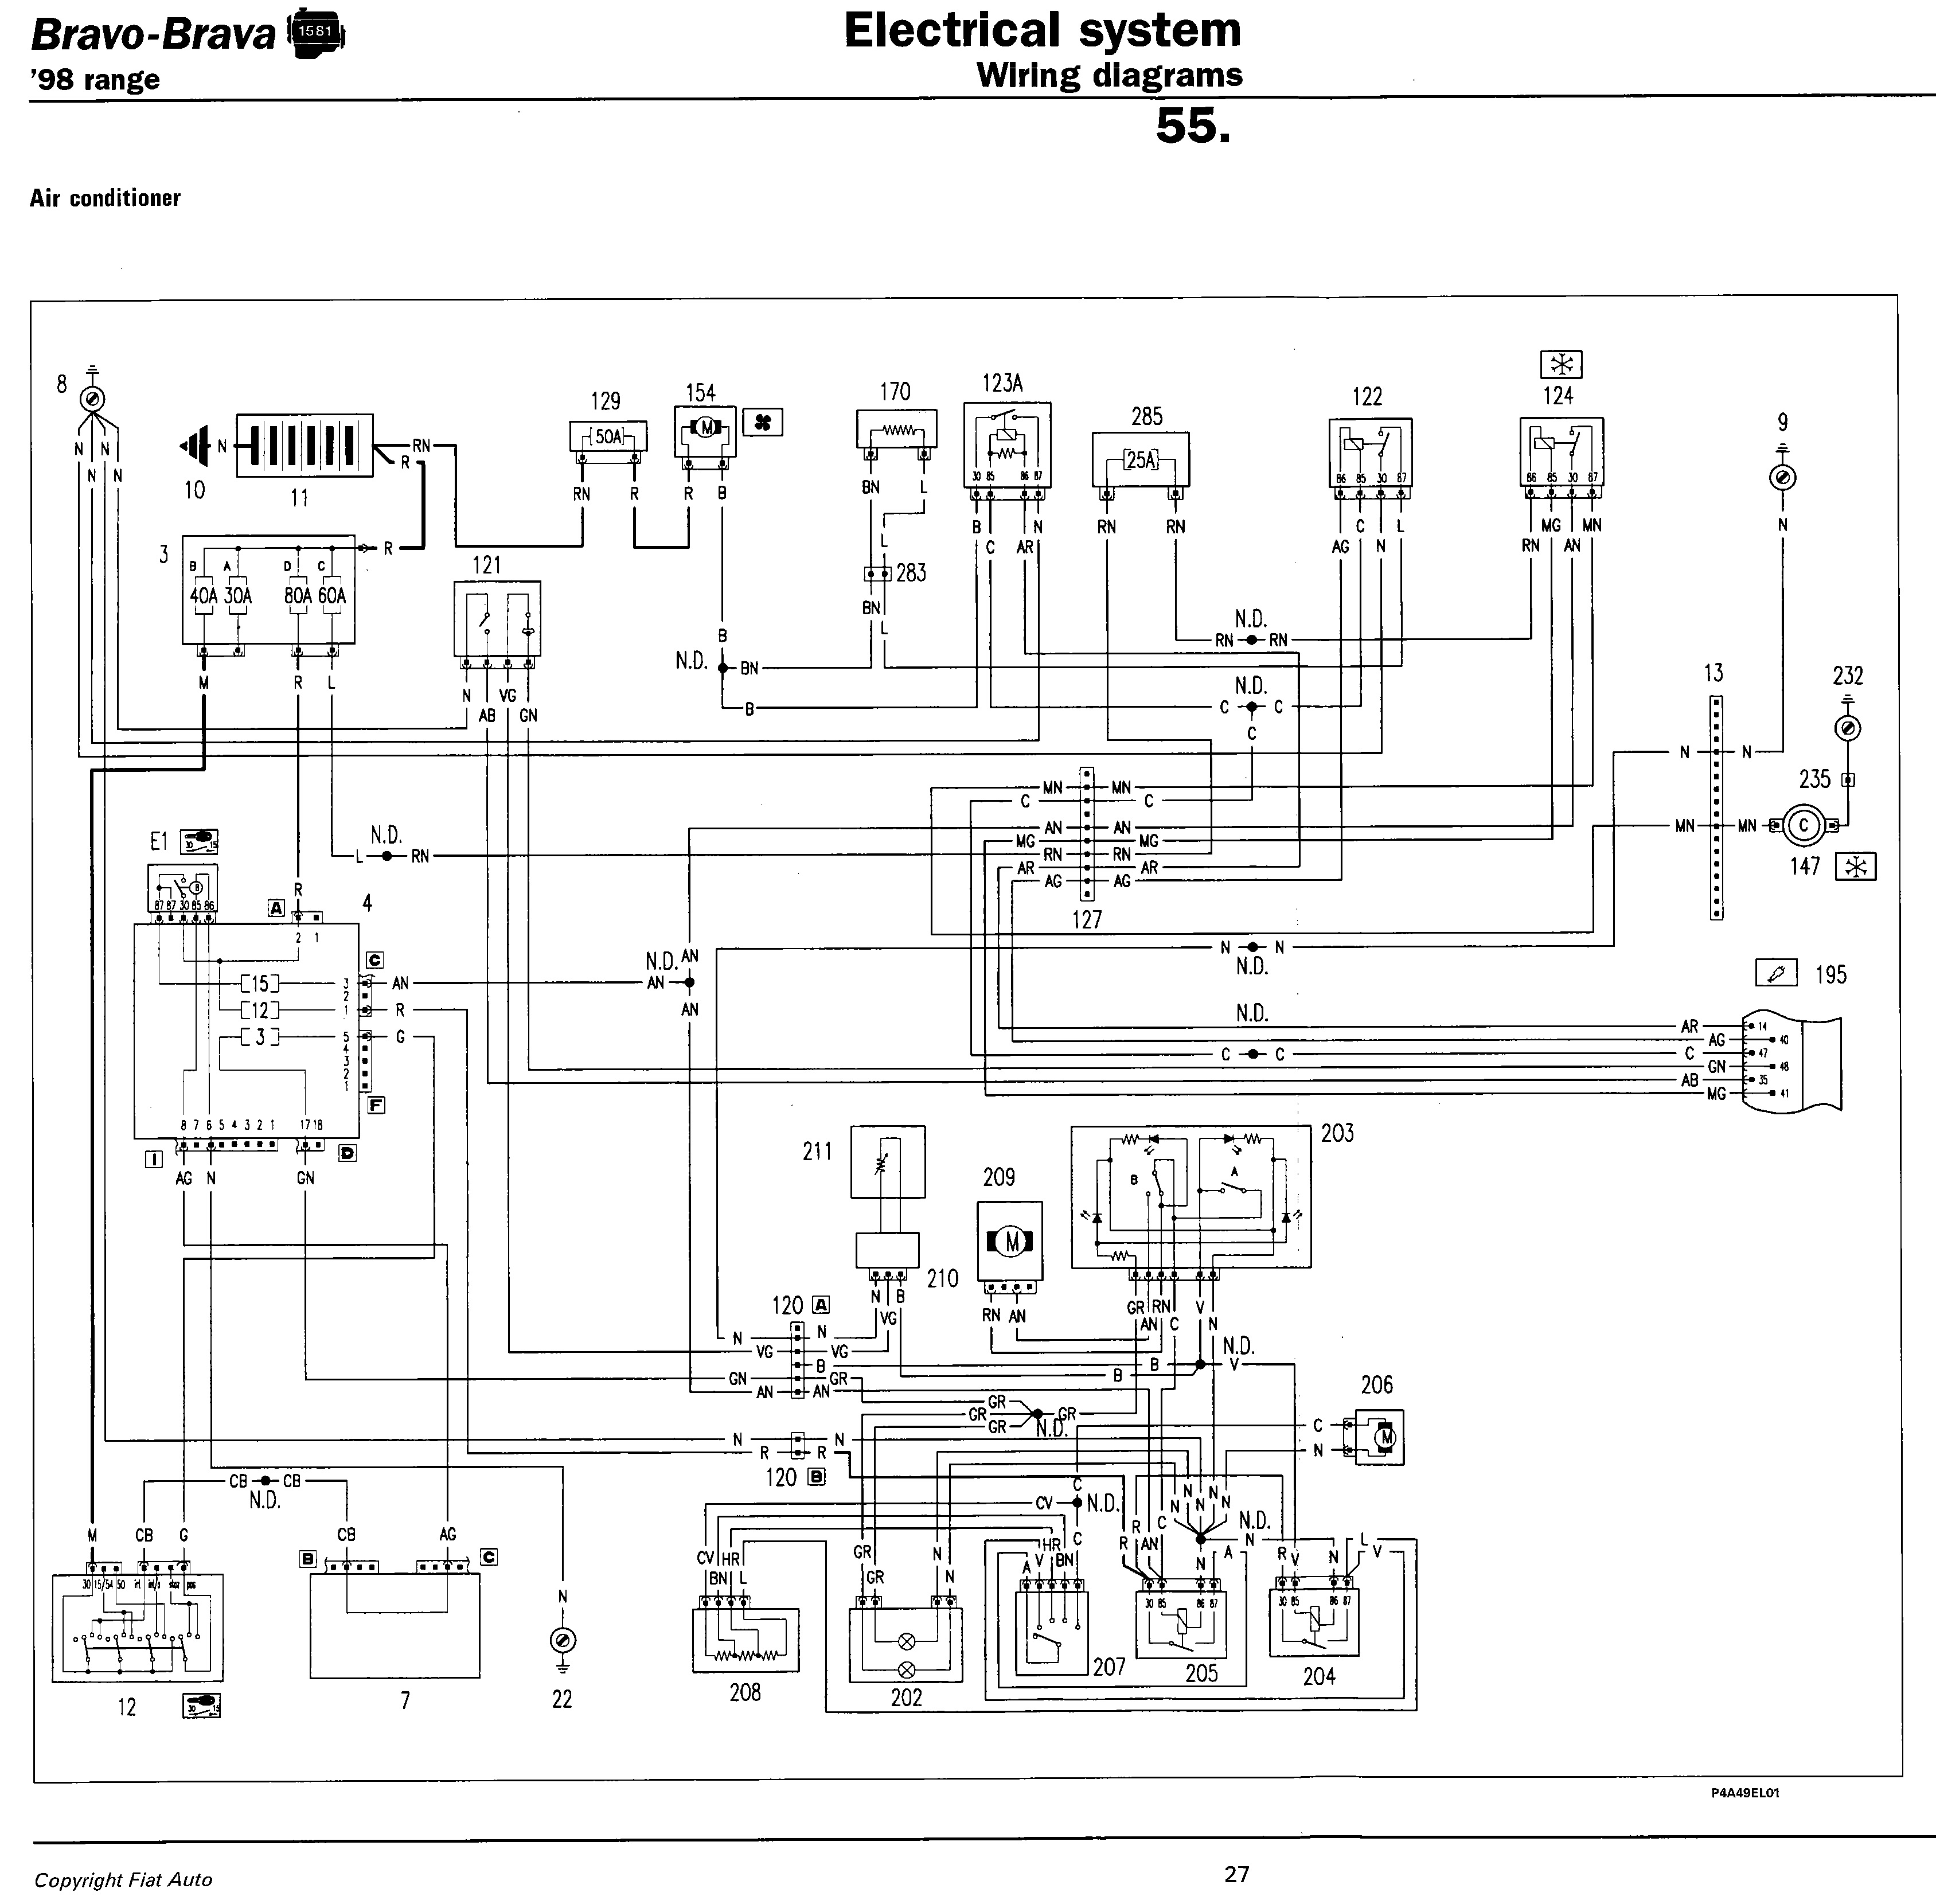 1989 Ski Doo Tundra Wiring Diagram Somurich Com Ski-Doo Tether Switch Wiring  Diagram Online Ski Doo Wiring Diagram Online